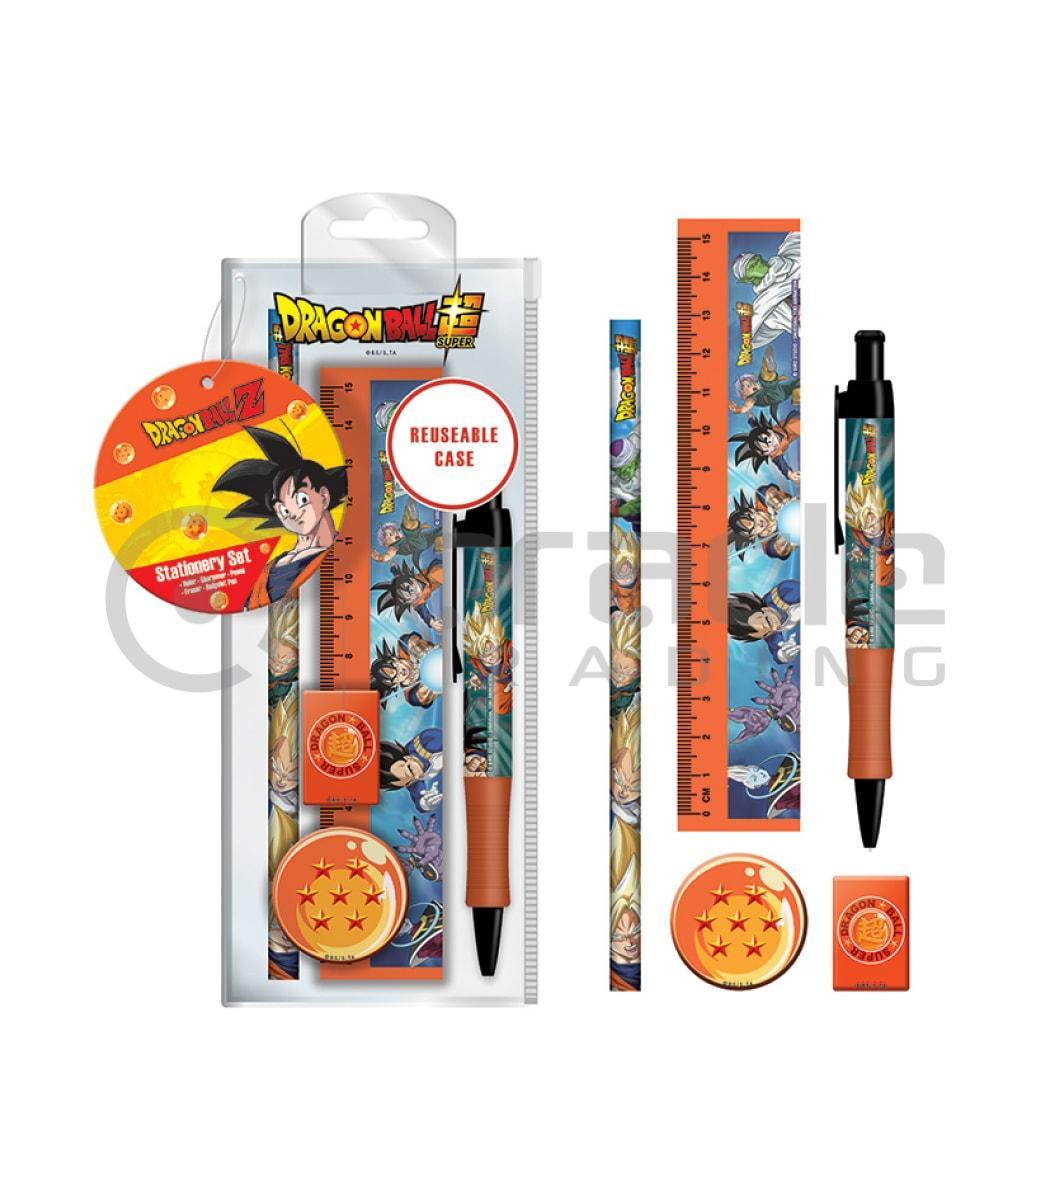 Dragon Ball Z Stationery Set